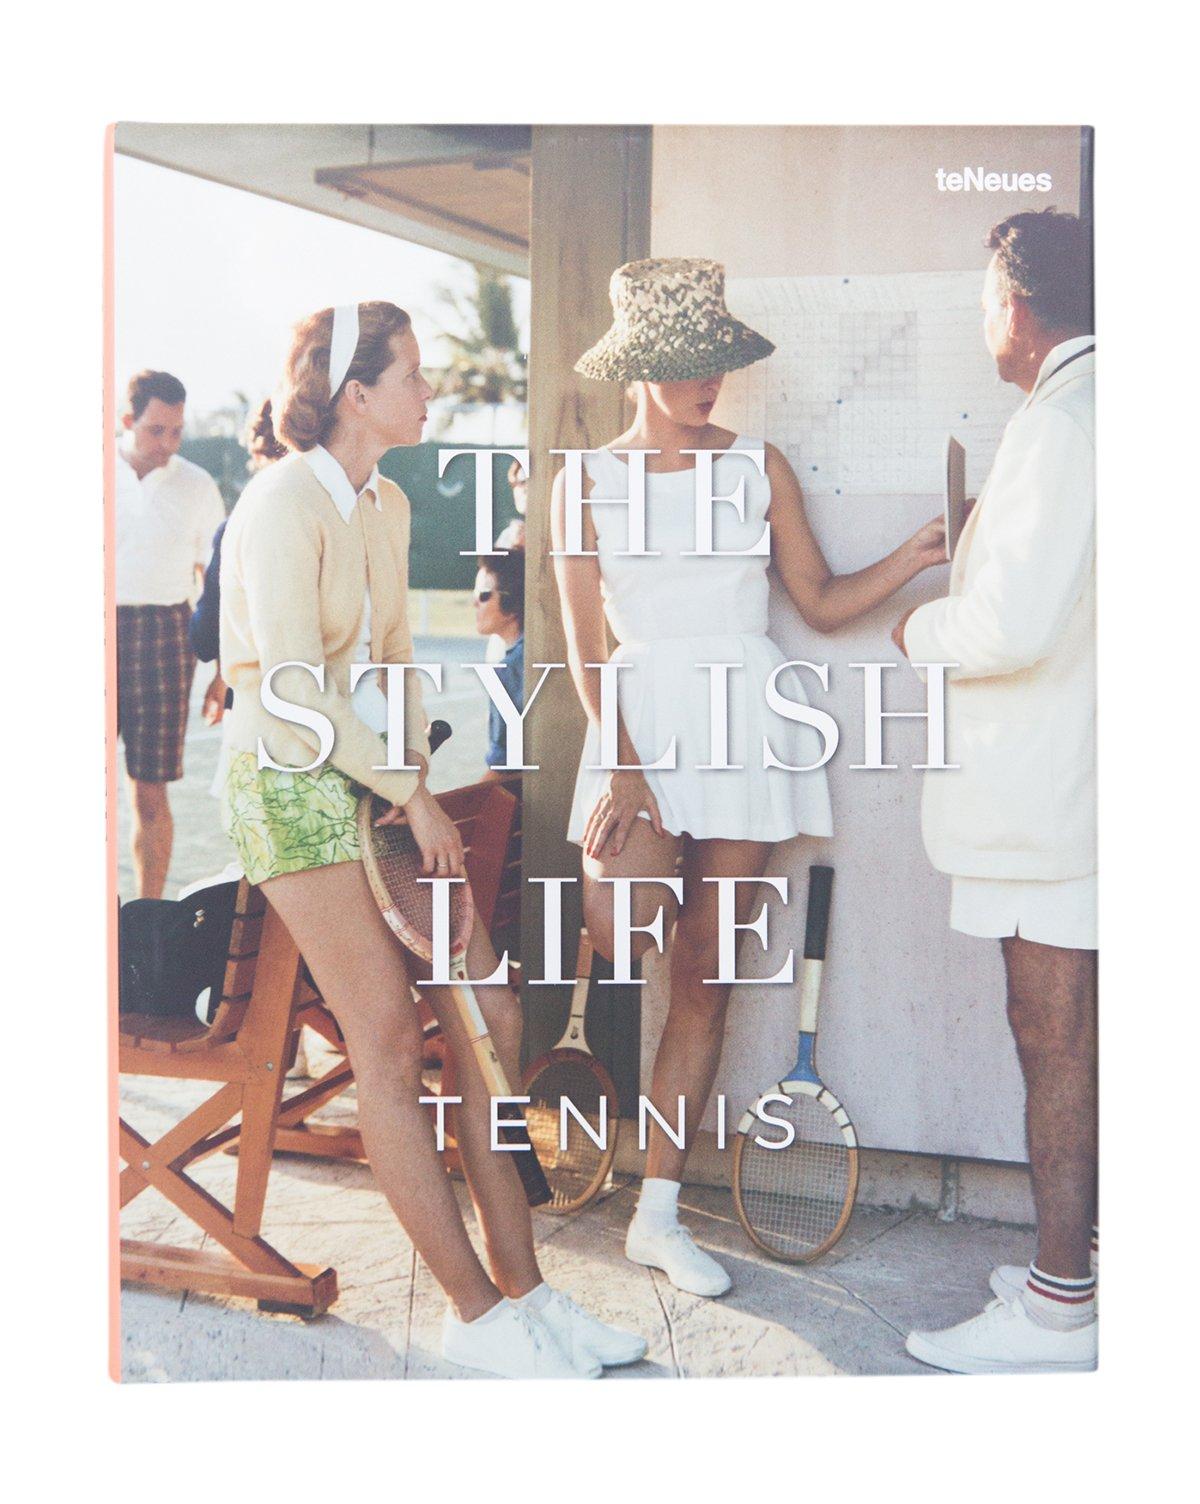 The_Stylish_Life_Tennis_1.jpg